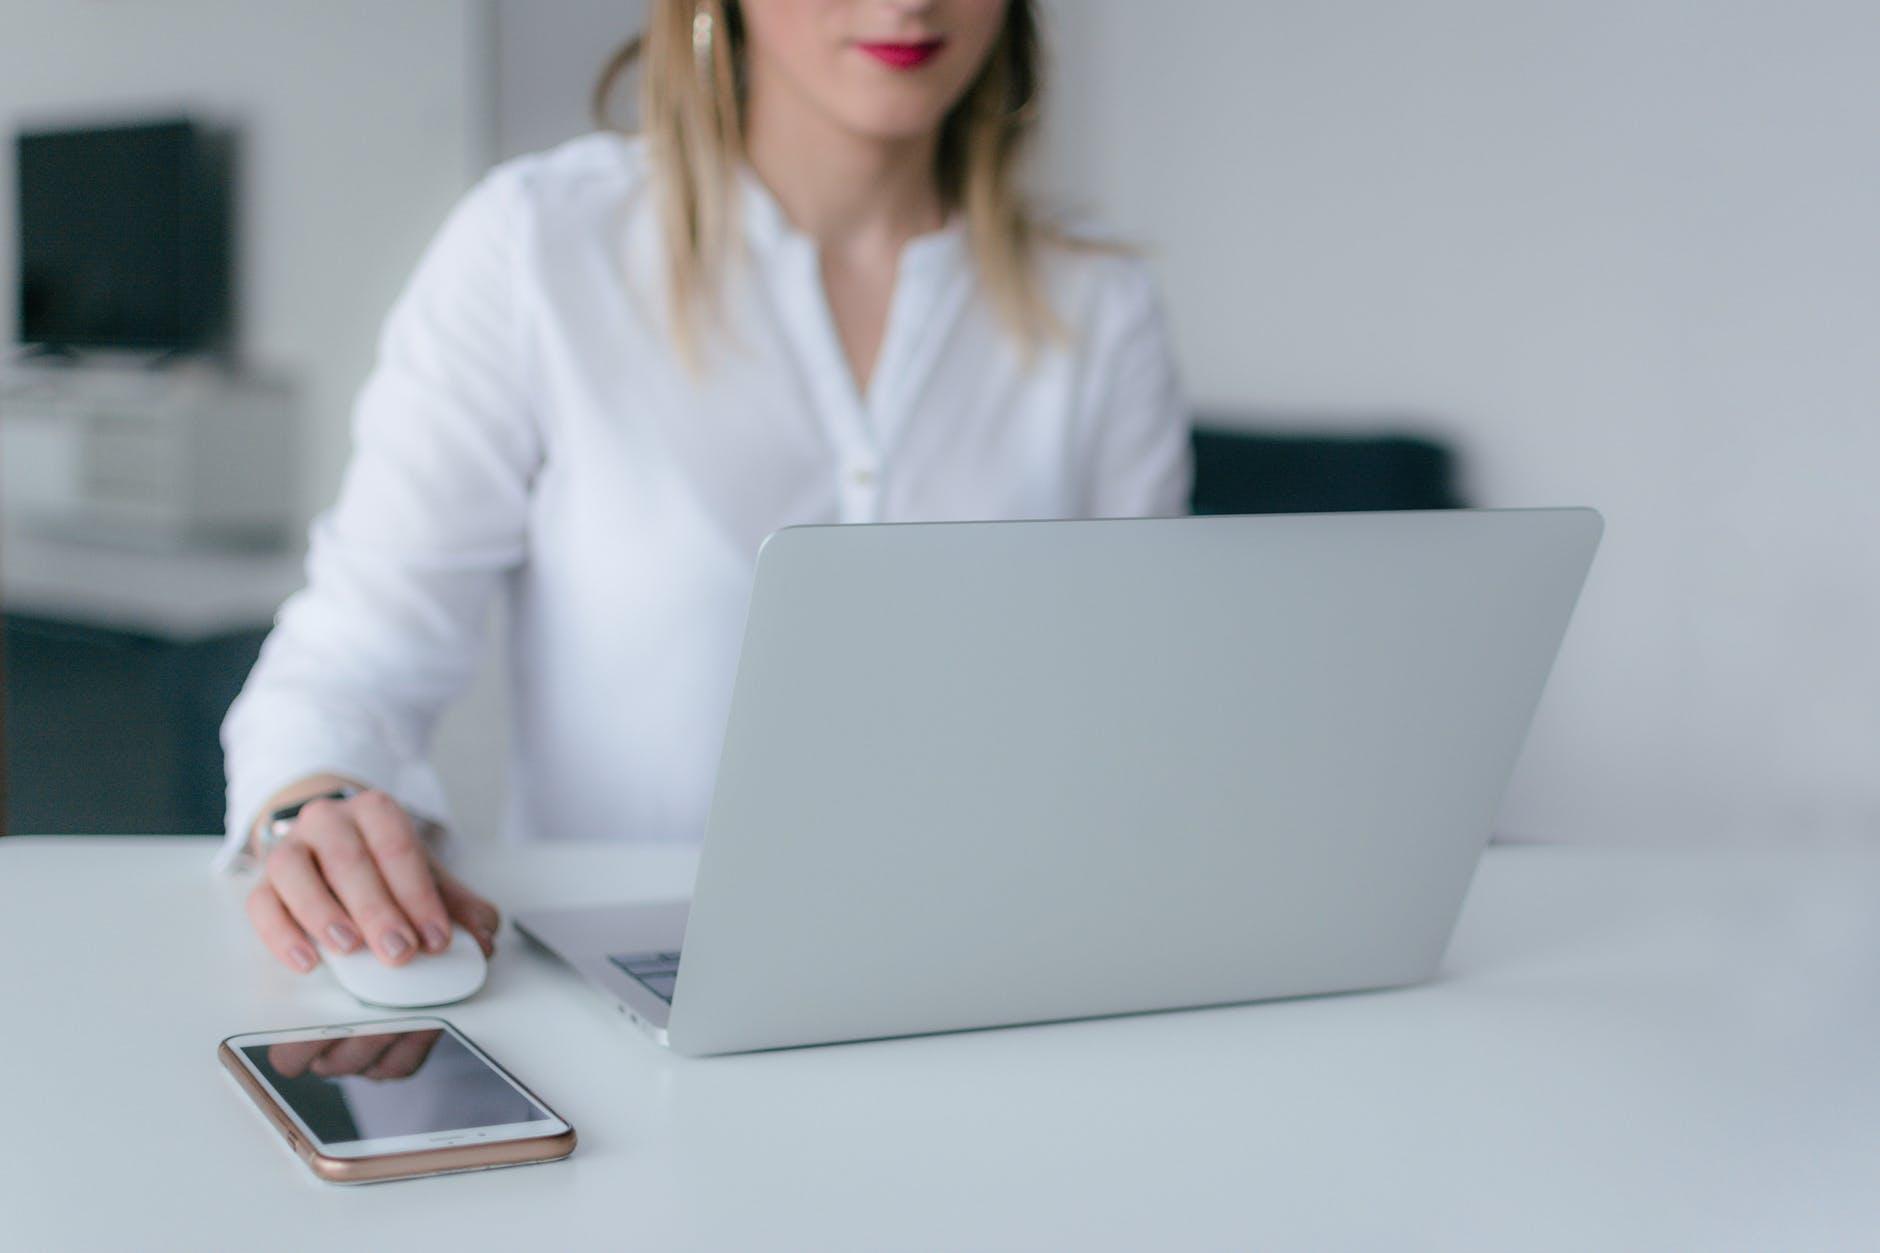 candidata cerca lavoro online